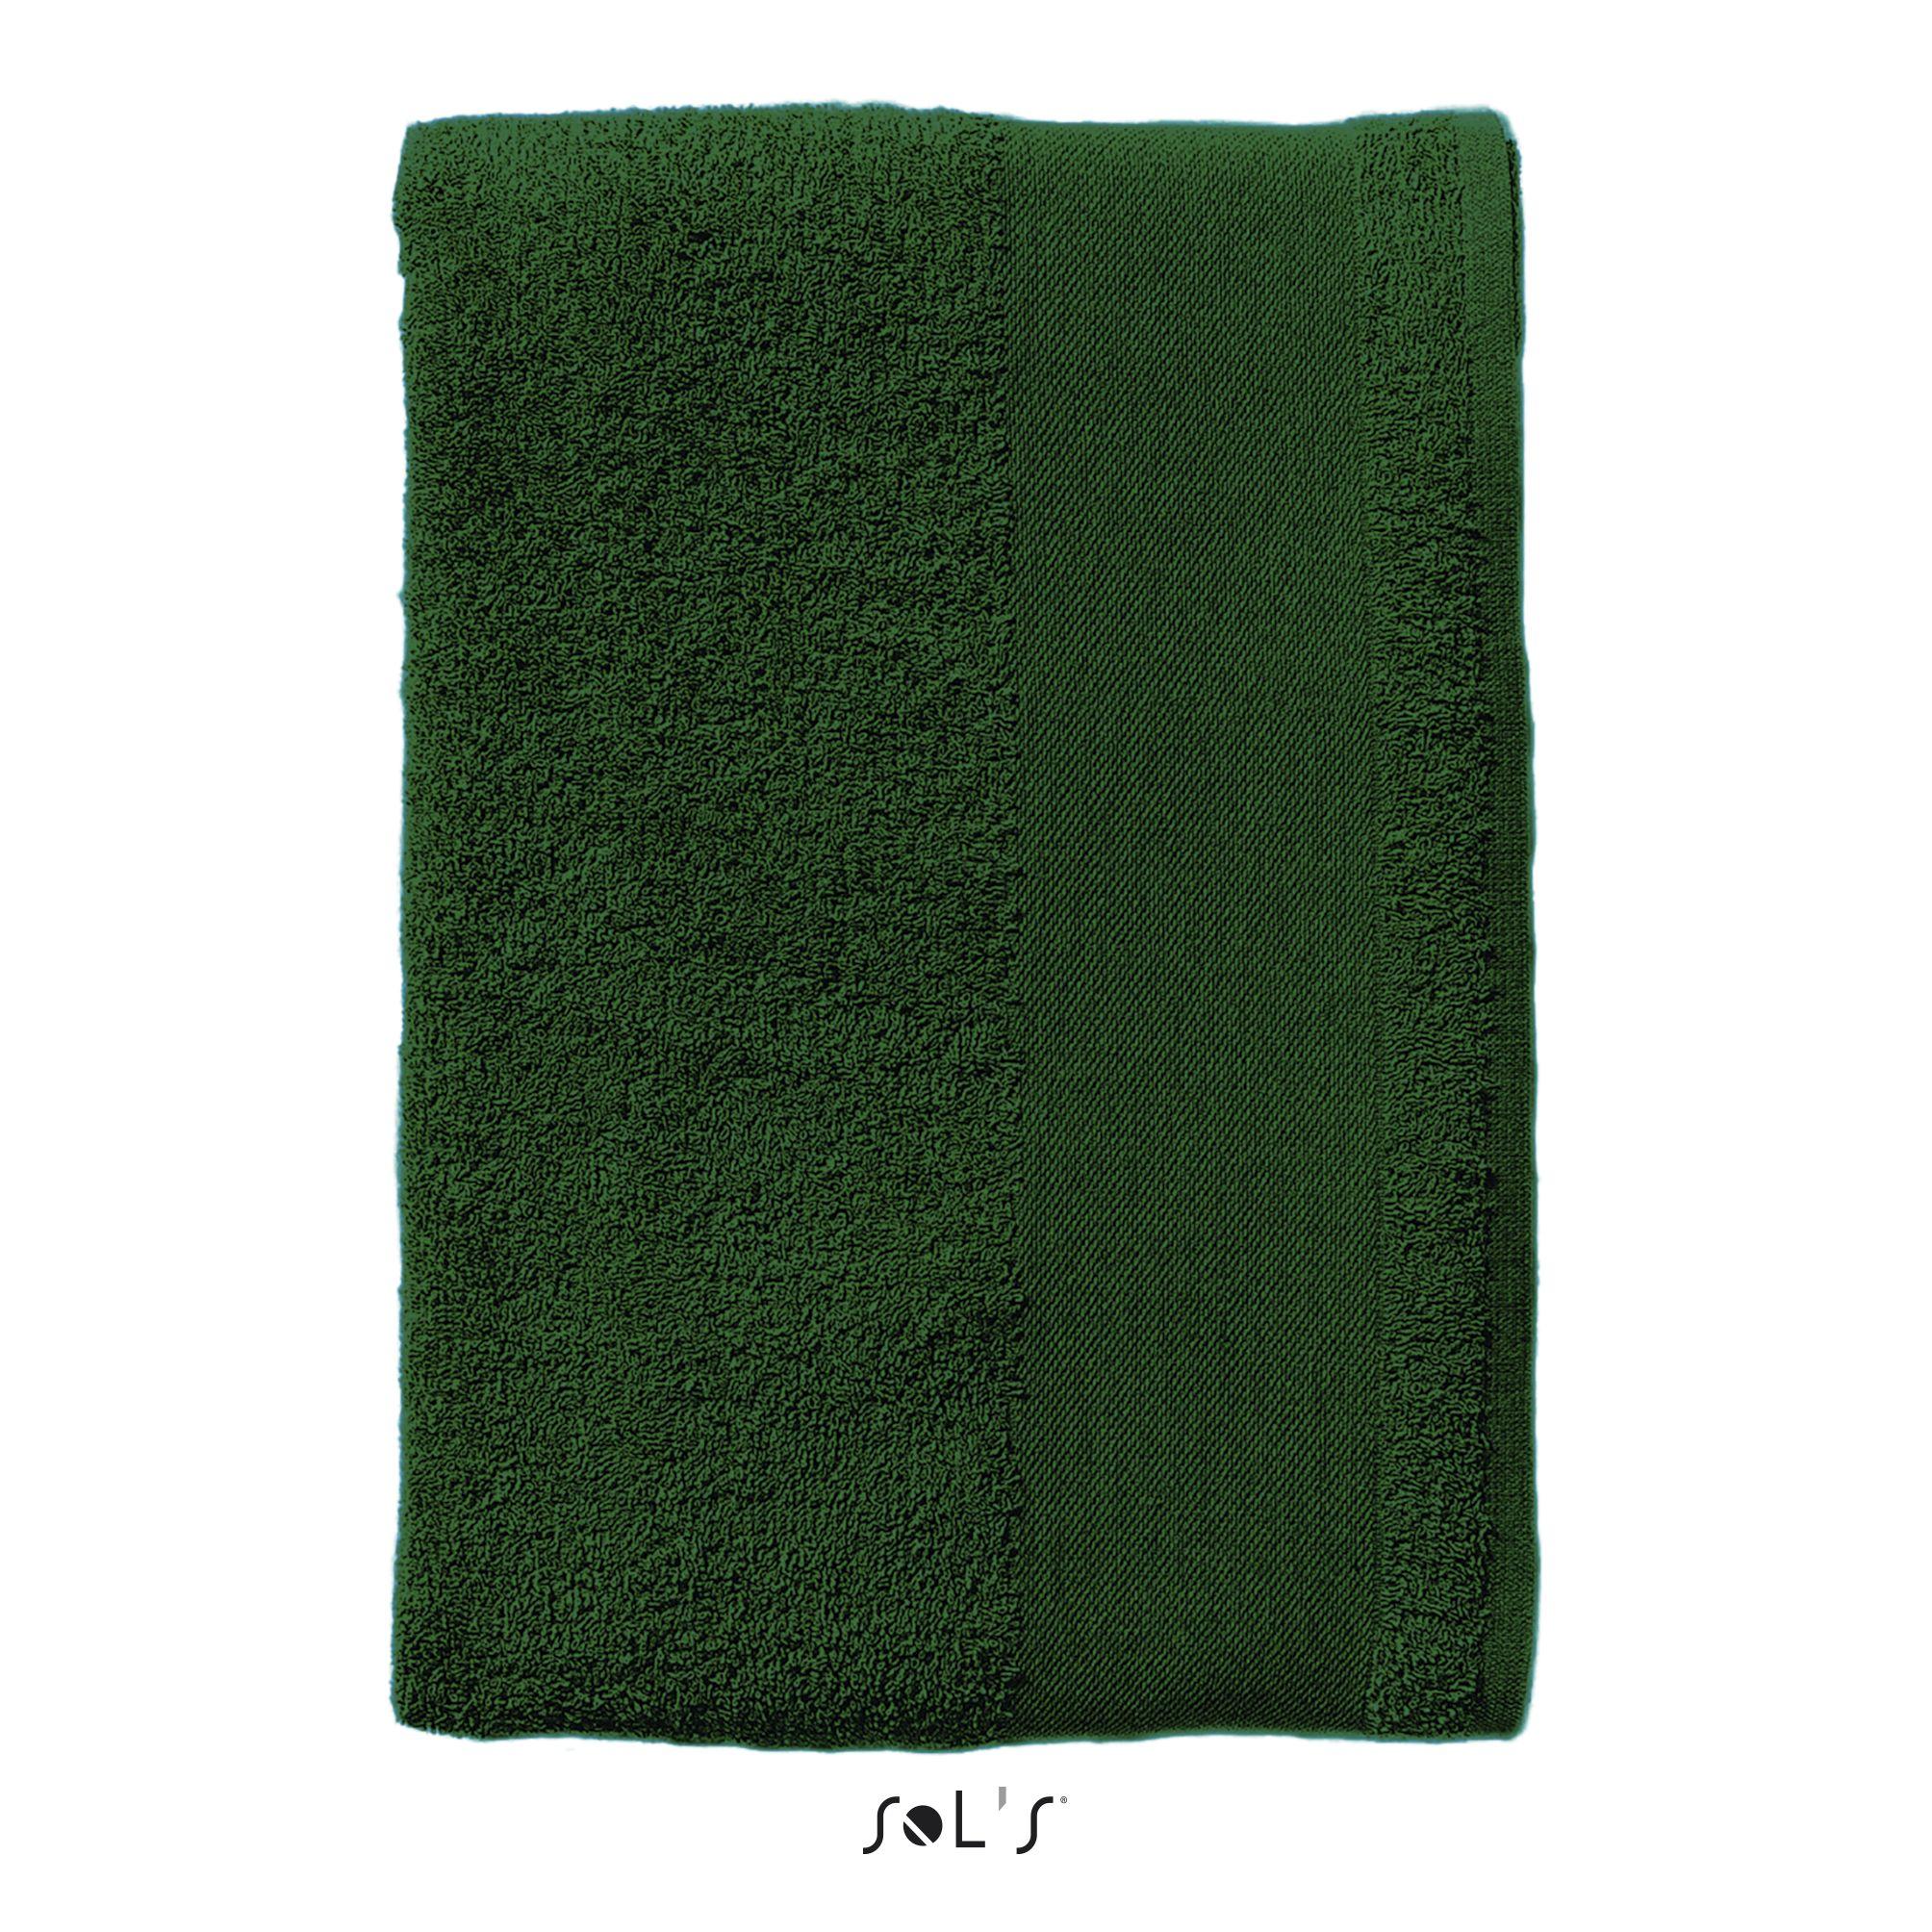 264 - Vert bouteille